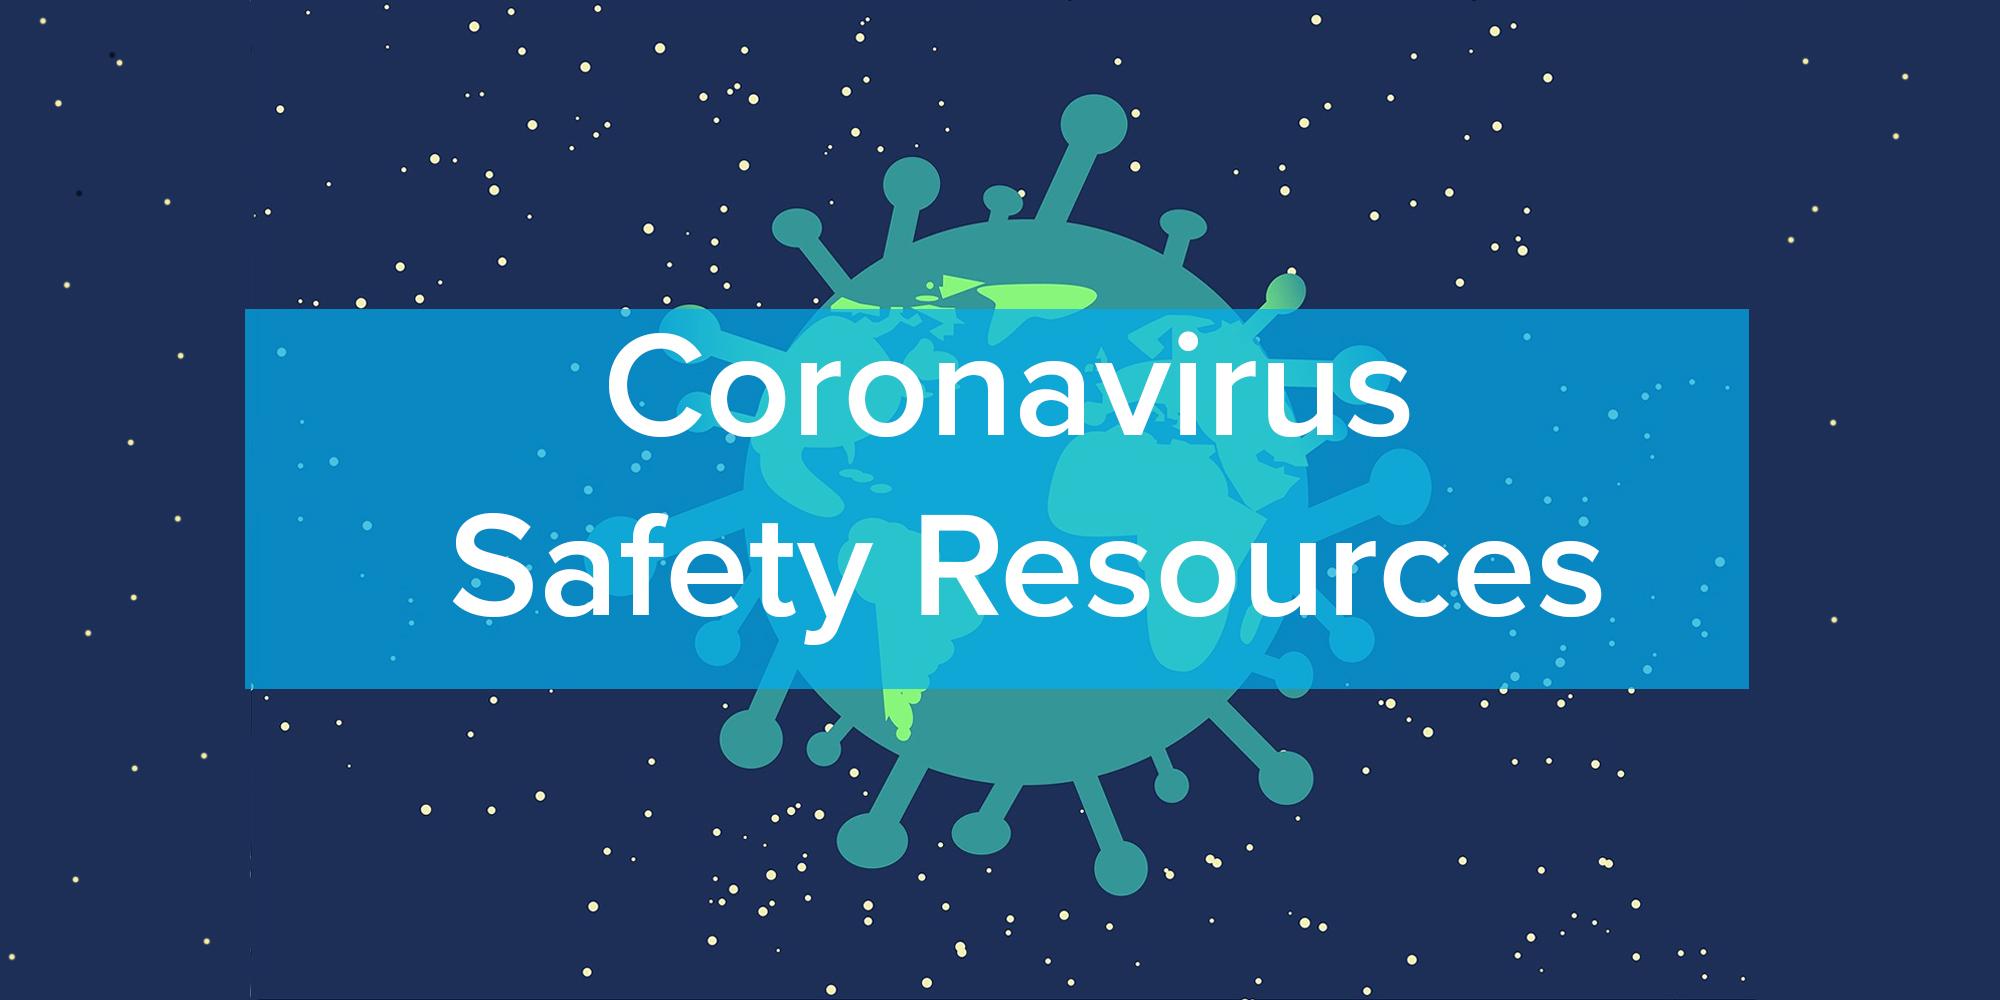 Coronavirus Safety Resources